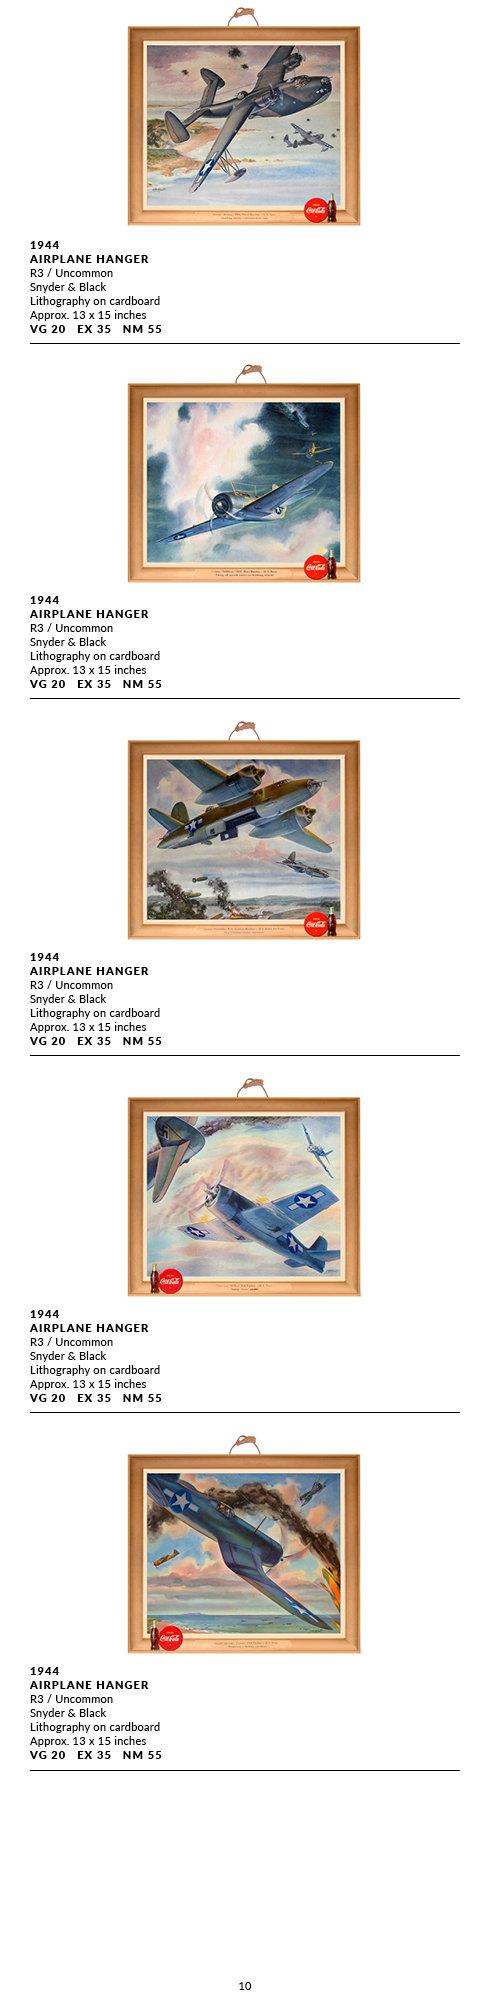 Aviation Cardboards_ DESKTOP_2020_10.jpg